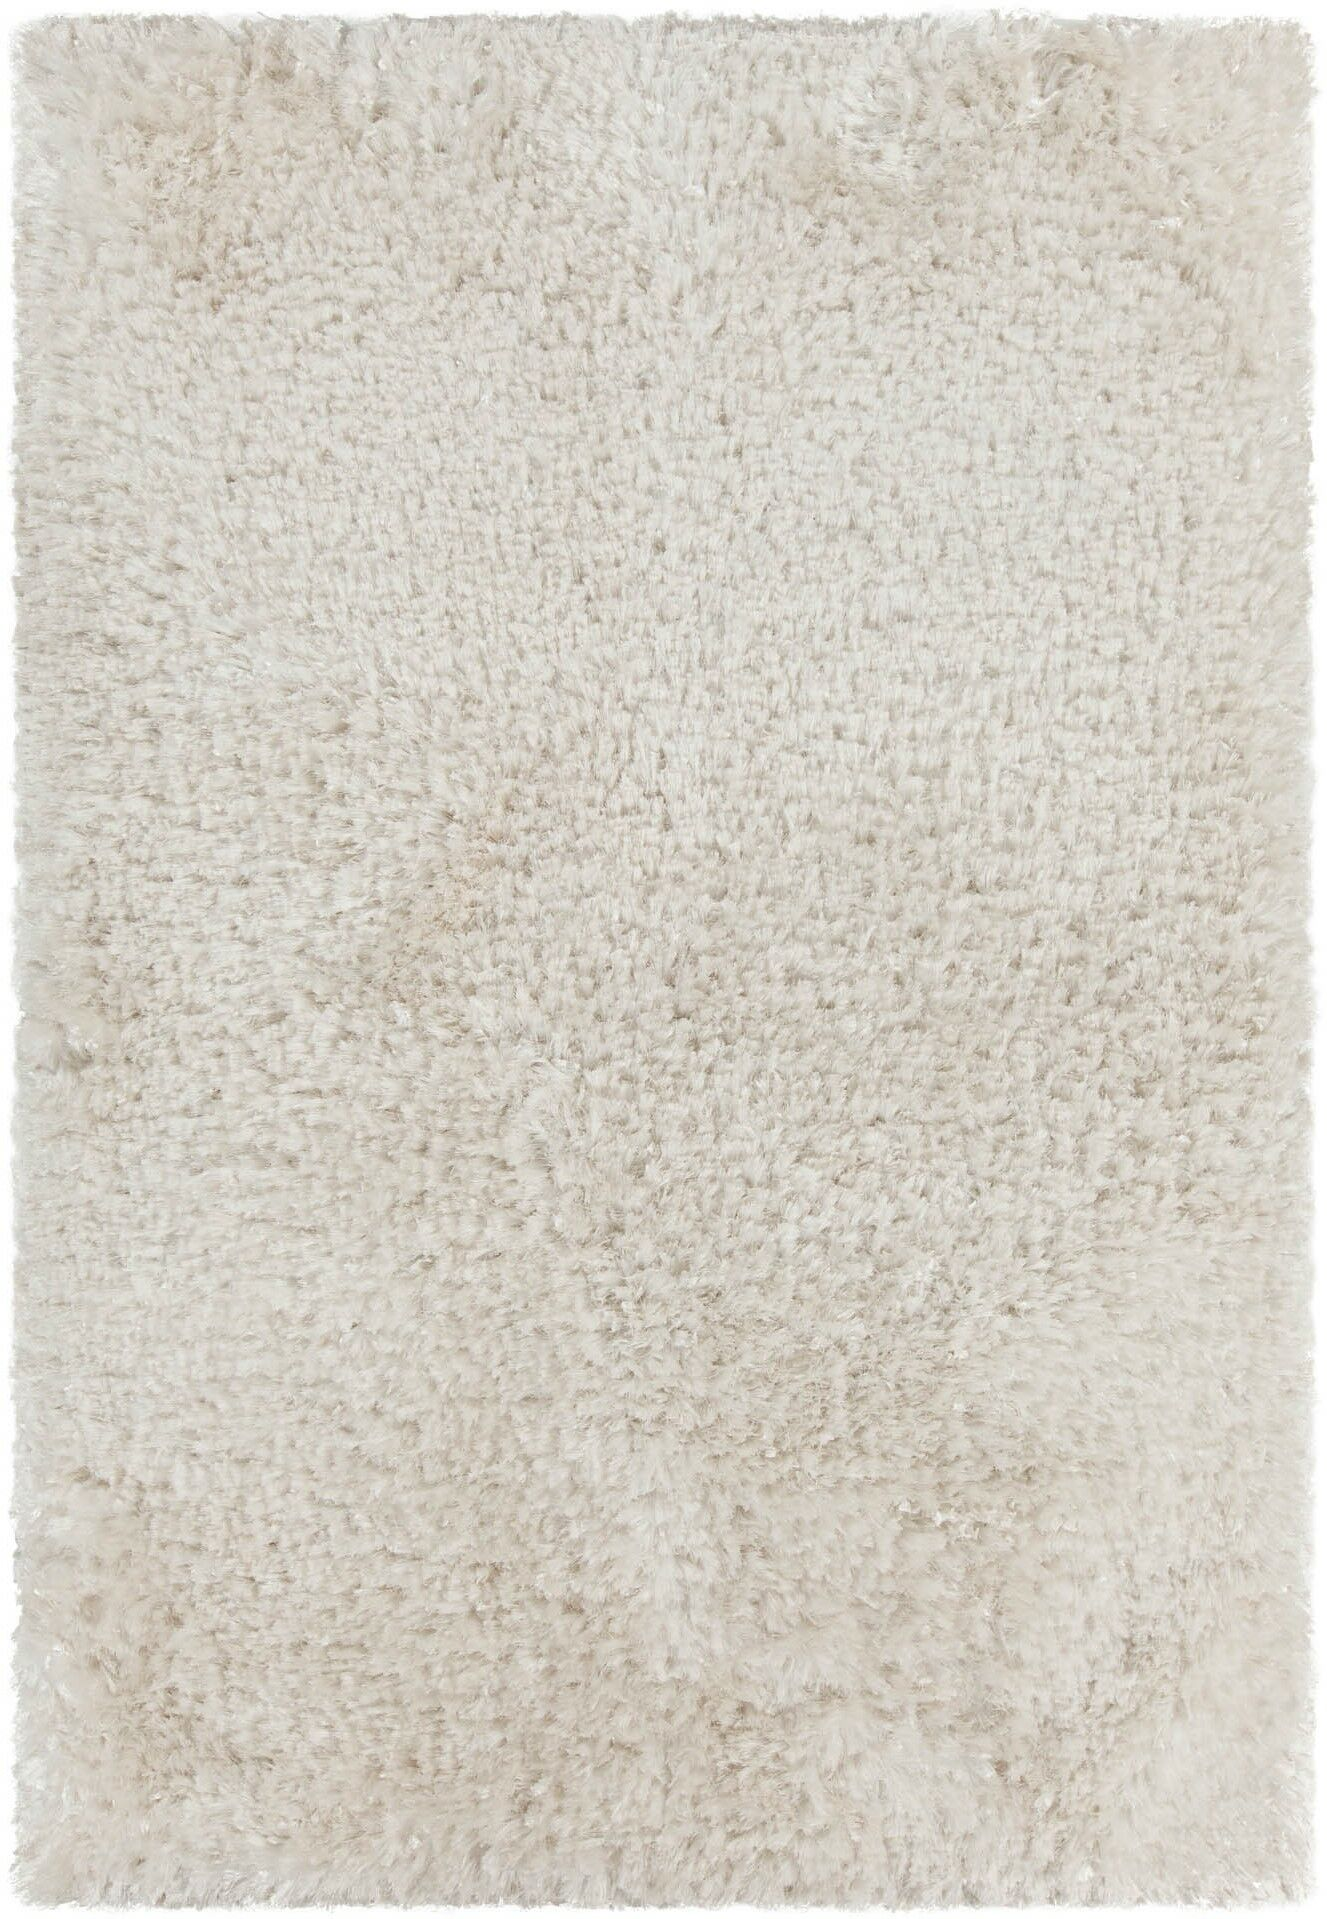 Mairead Textured Shag White Area Rug Rug Size: Round 7'9